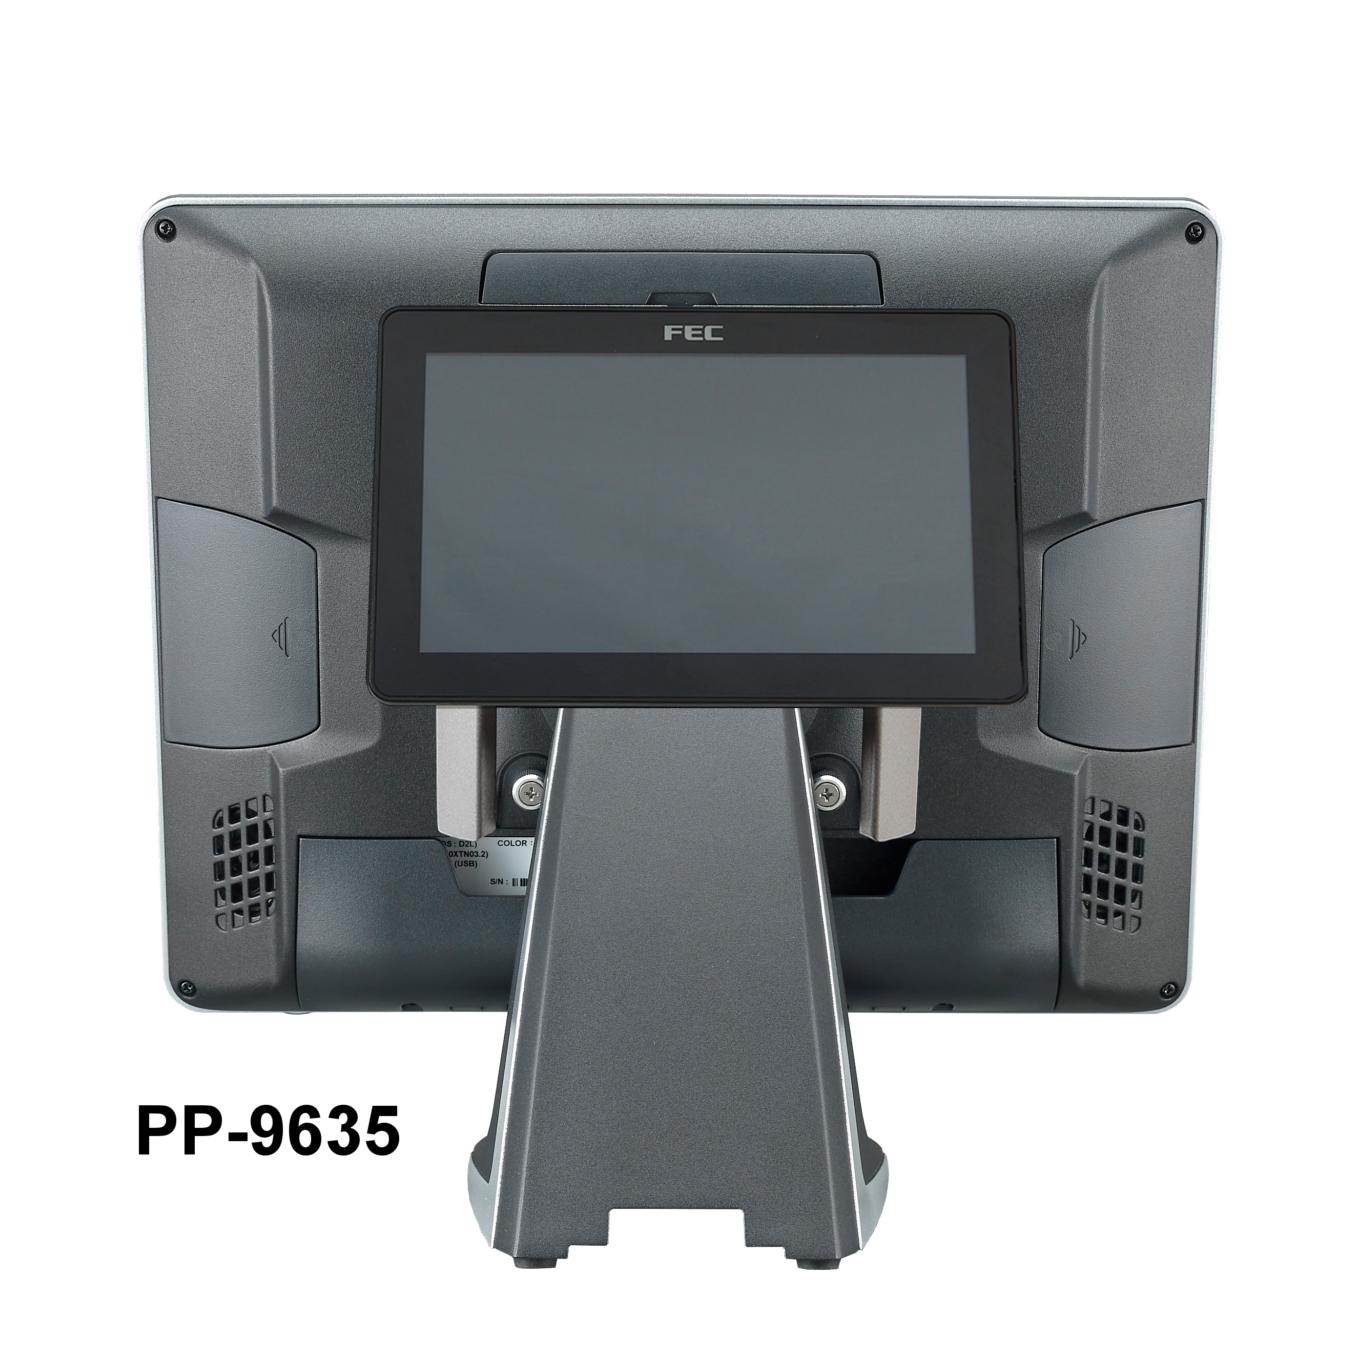 PP-9635